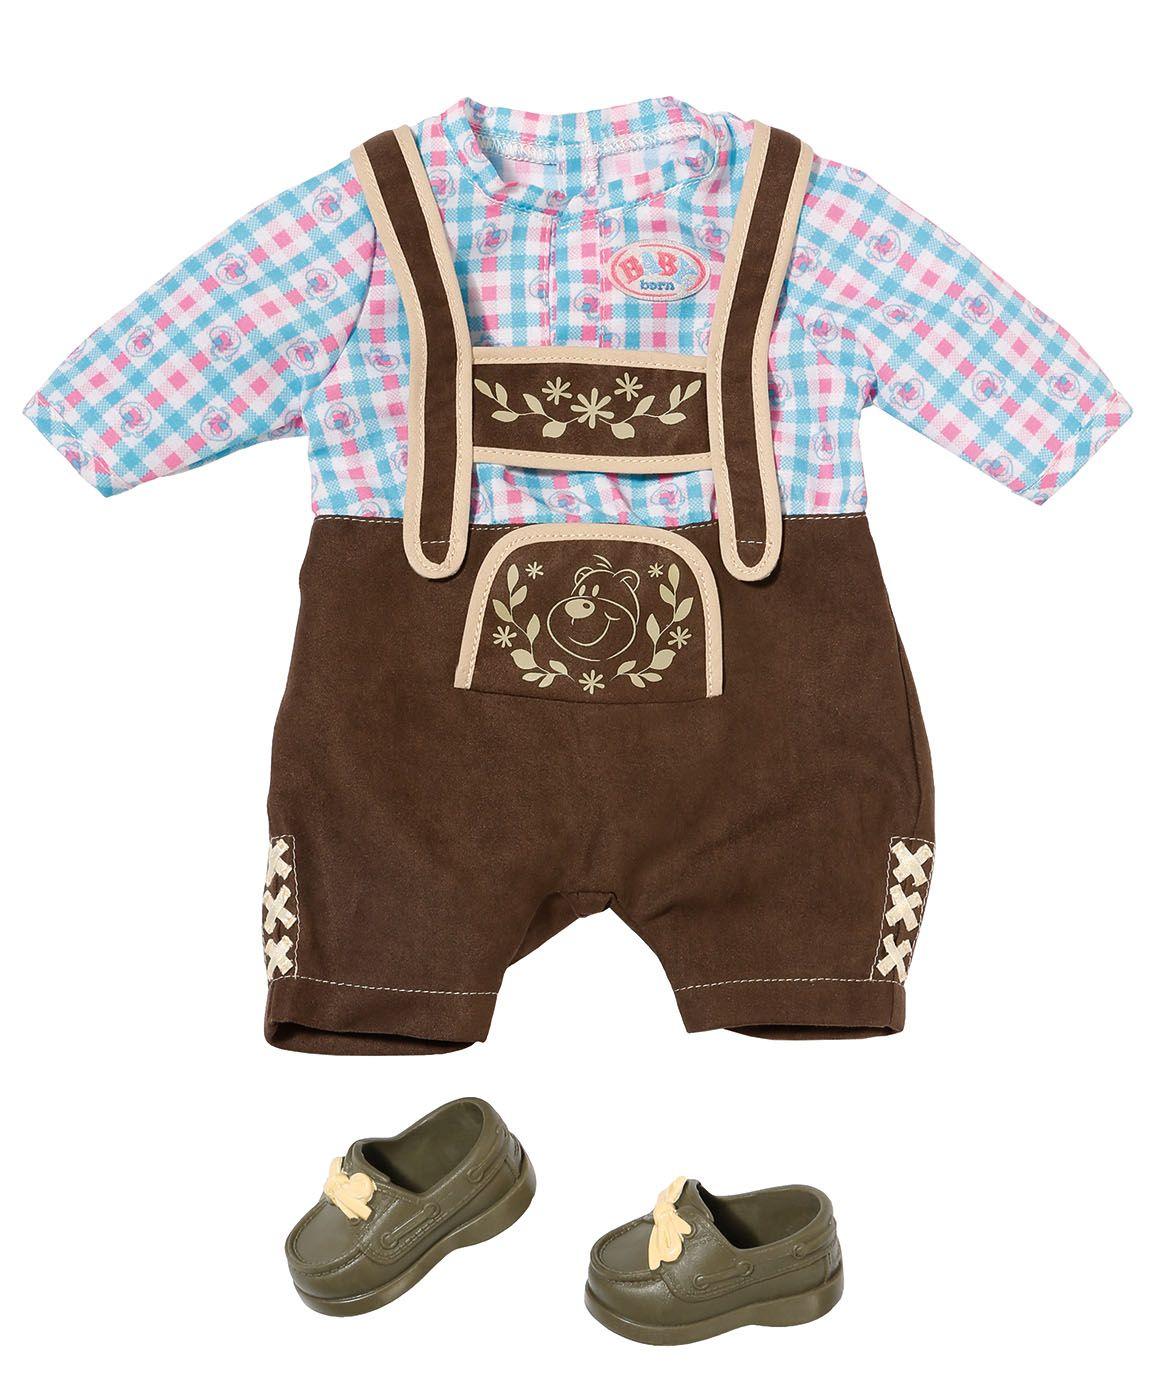 Baby Born Ubranko Dla Lalki Spodenki Ludowe 6730193763 Oficjalne Archiwum Allegro Baby Born Bavarian Costume Clothes